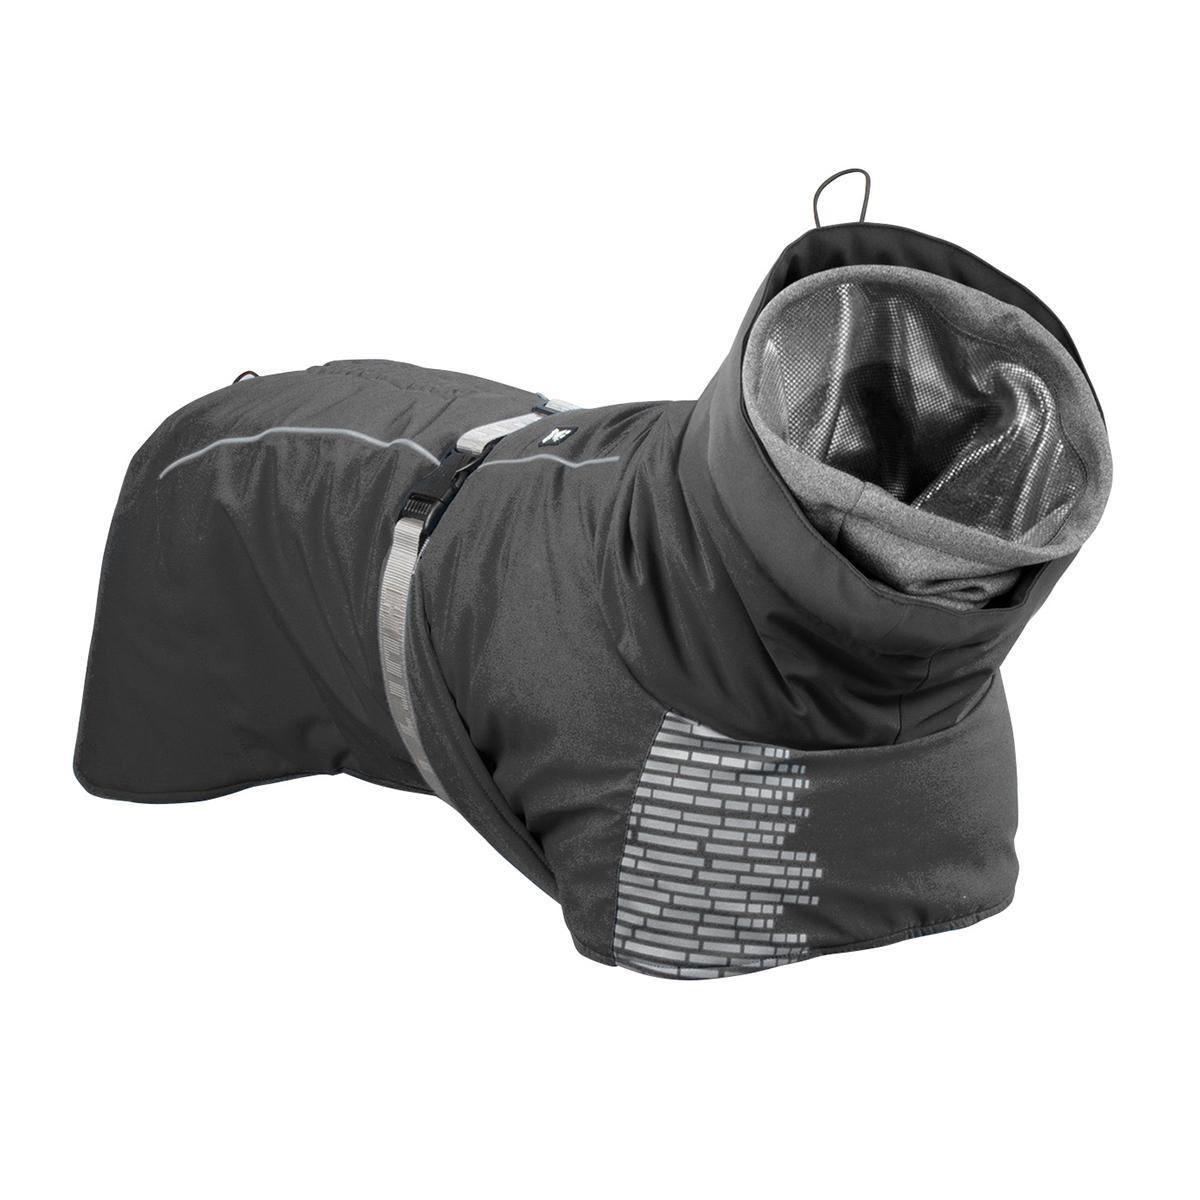 Hurtta Extreme Warmer Dog Coat - Granite Gray